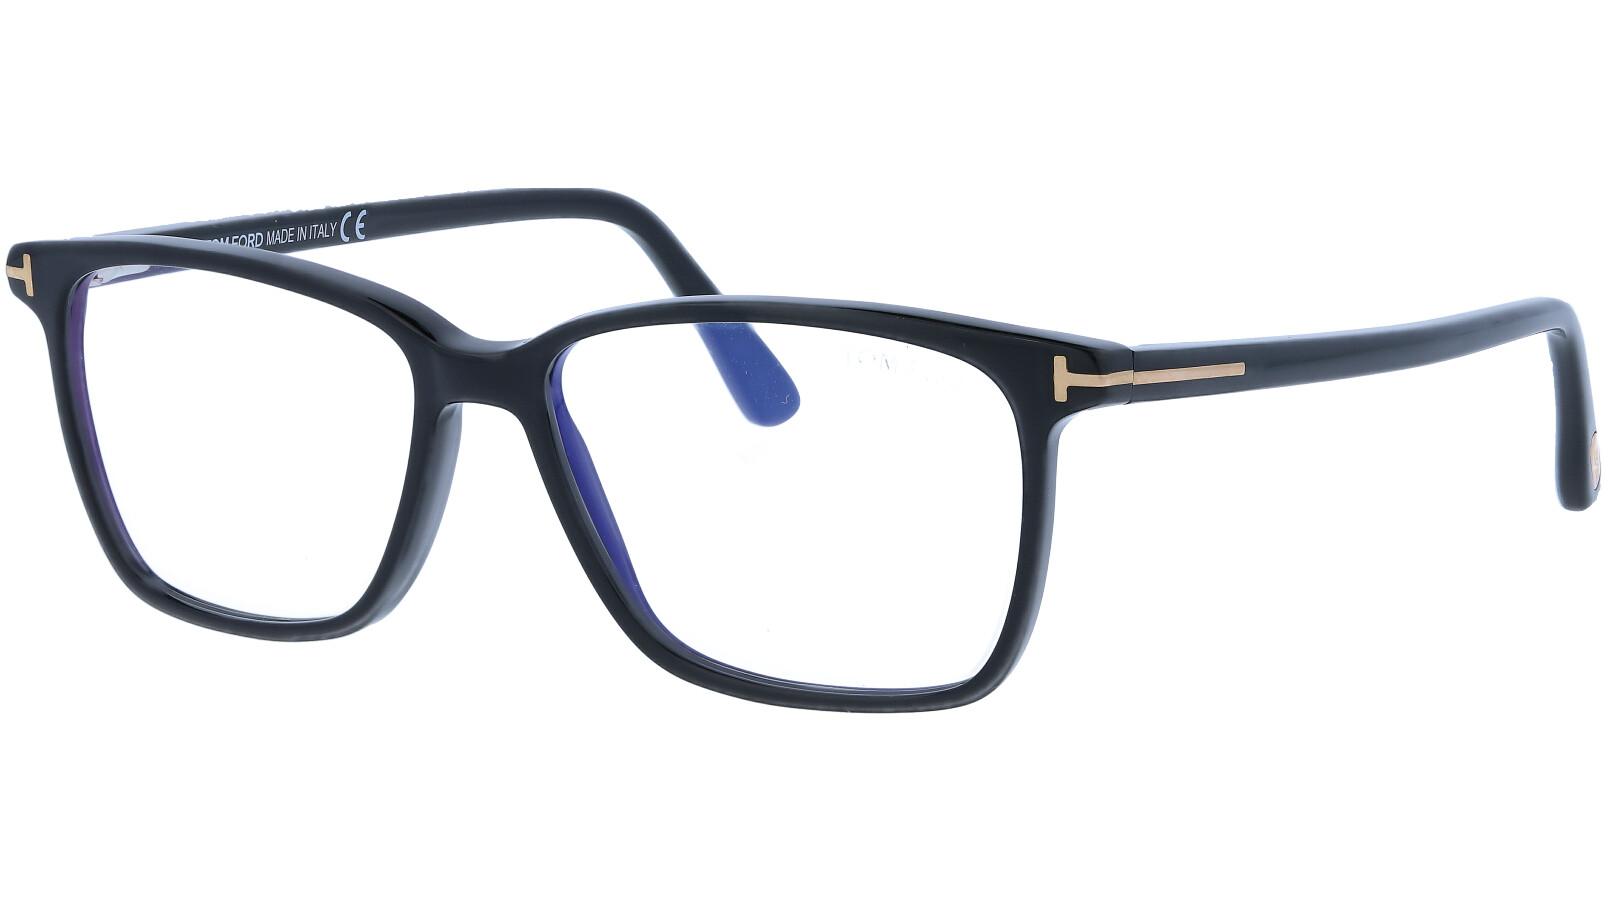 Tom Ford TF5478-B 001 56 Black Glasses